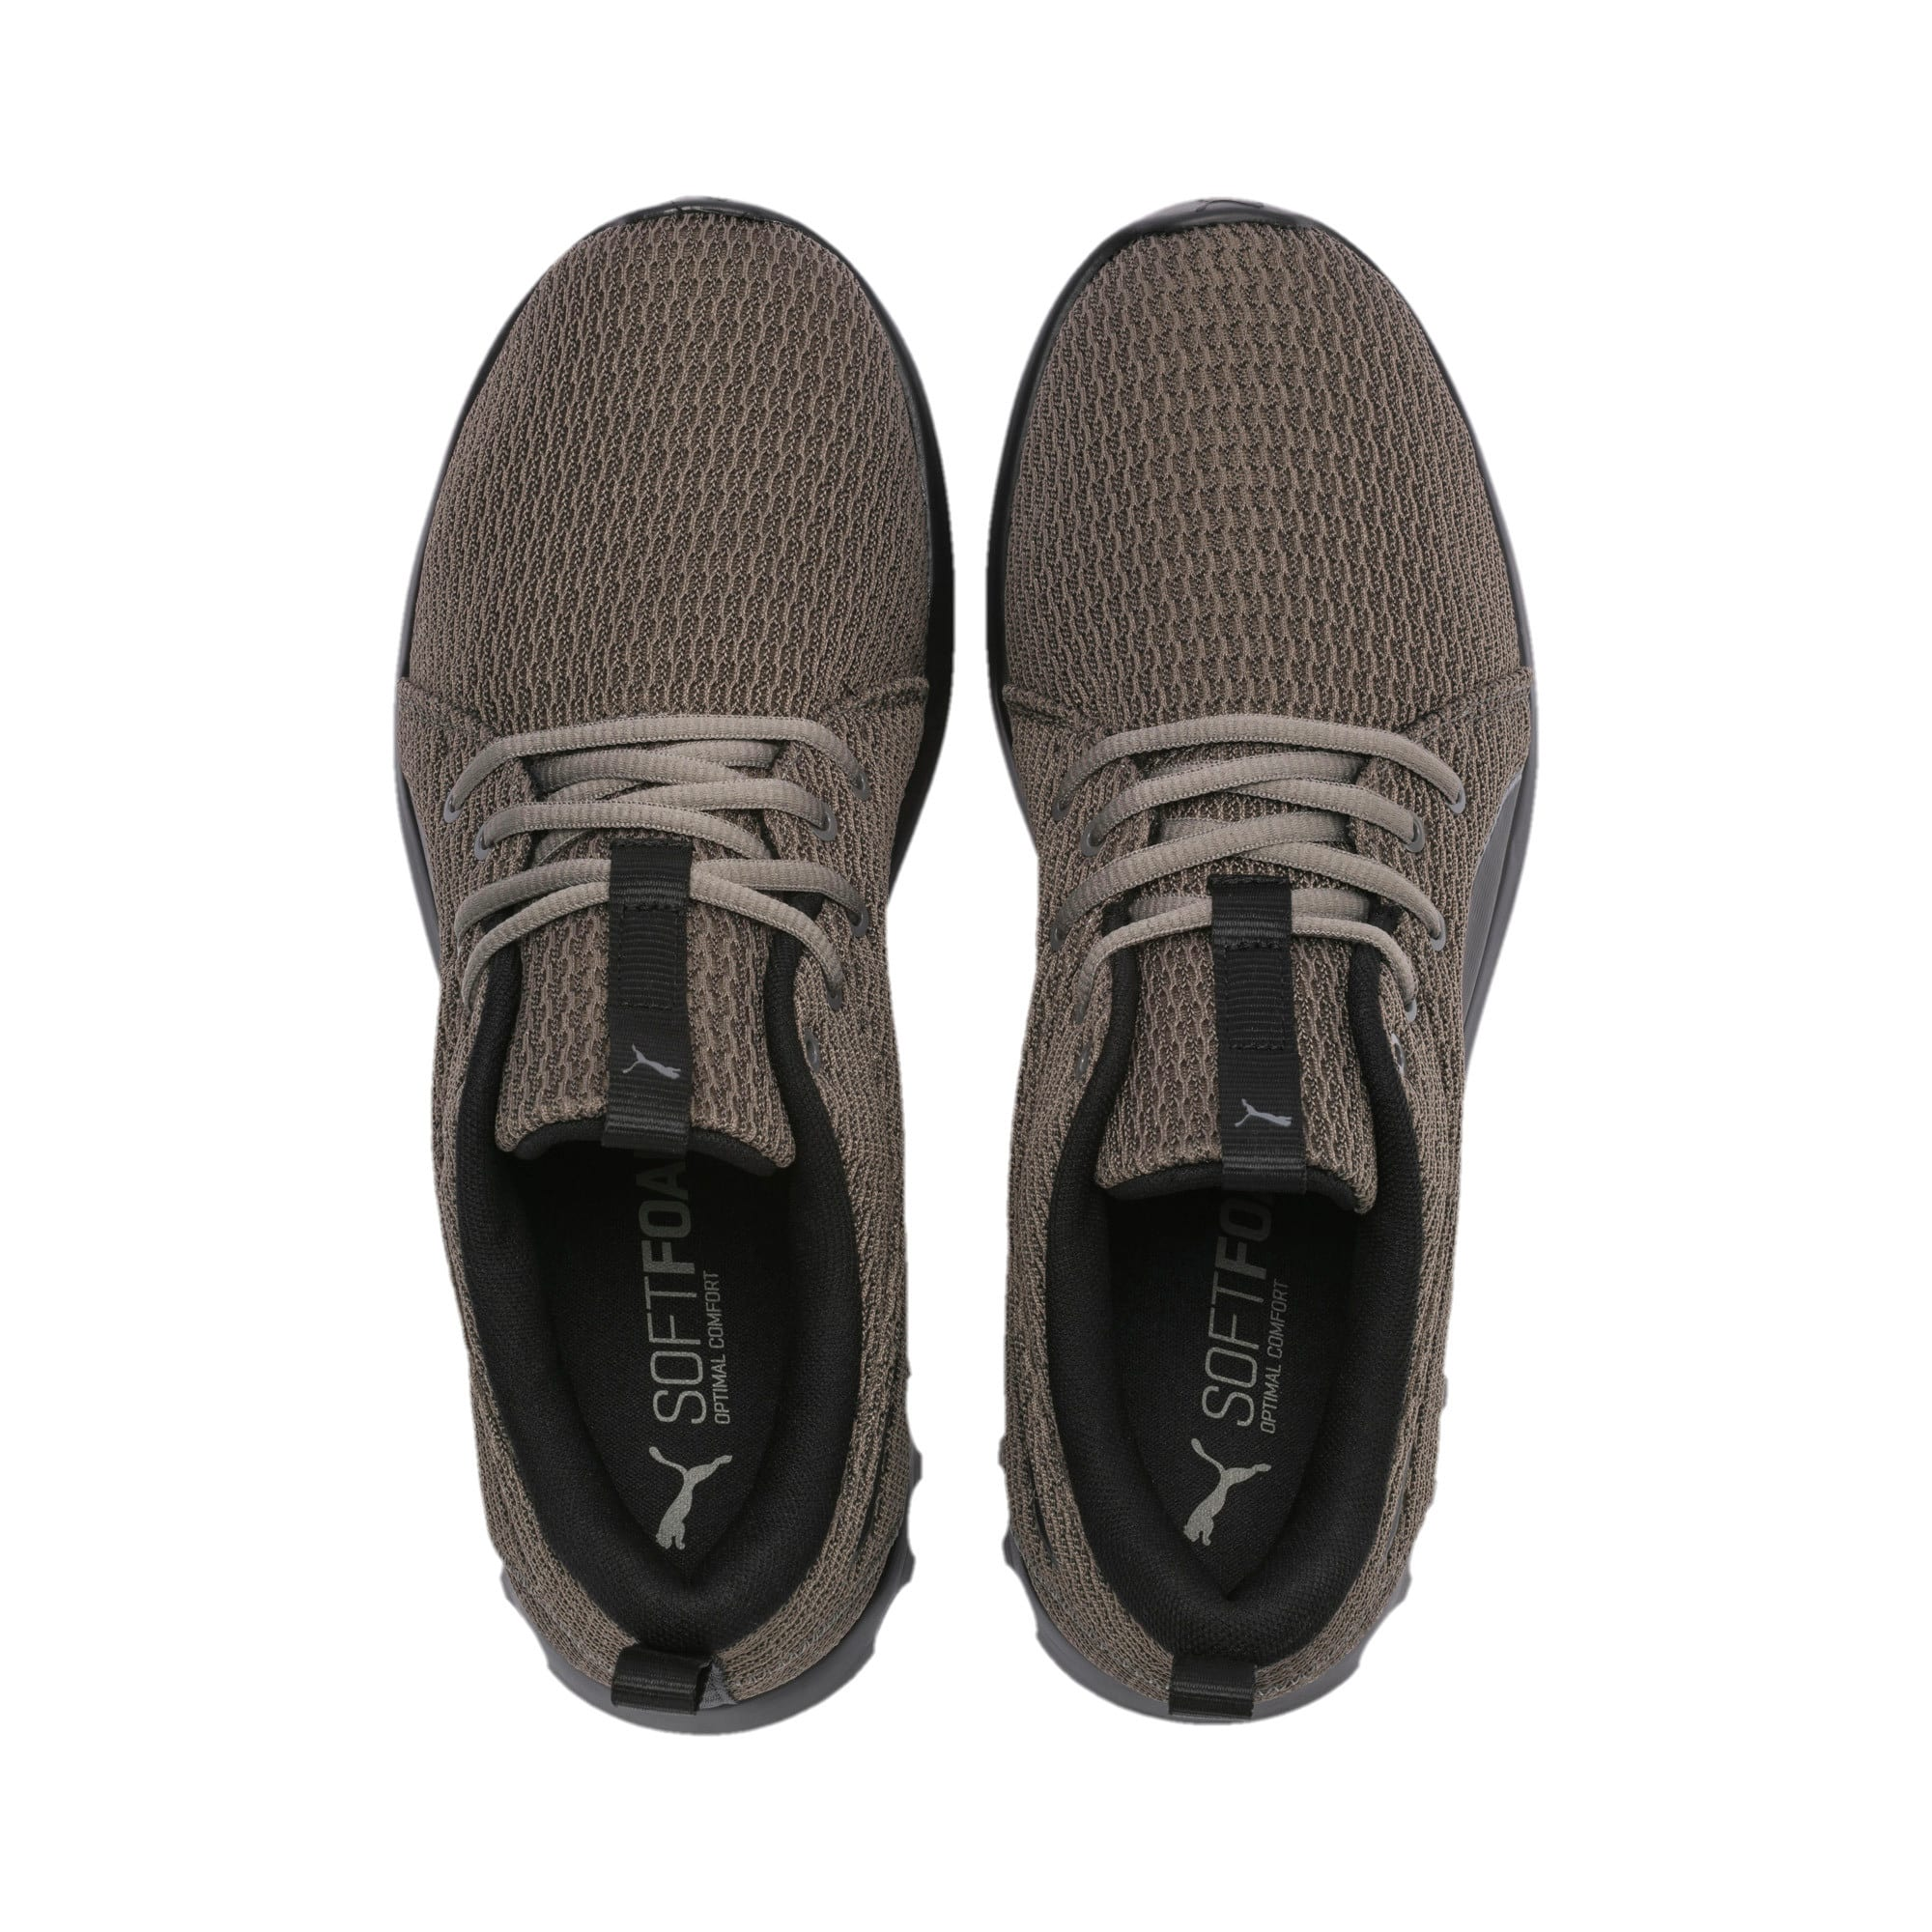 Miniatura 6 de Zapatos para correrCarson 2 New Corepara hombre, Charcoal Gray-Puma Black, mediano